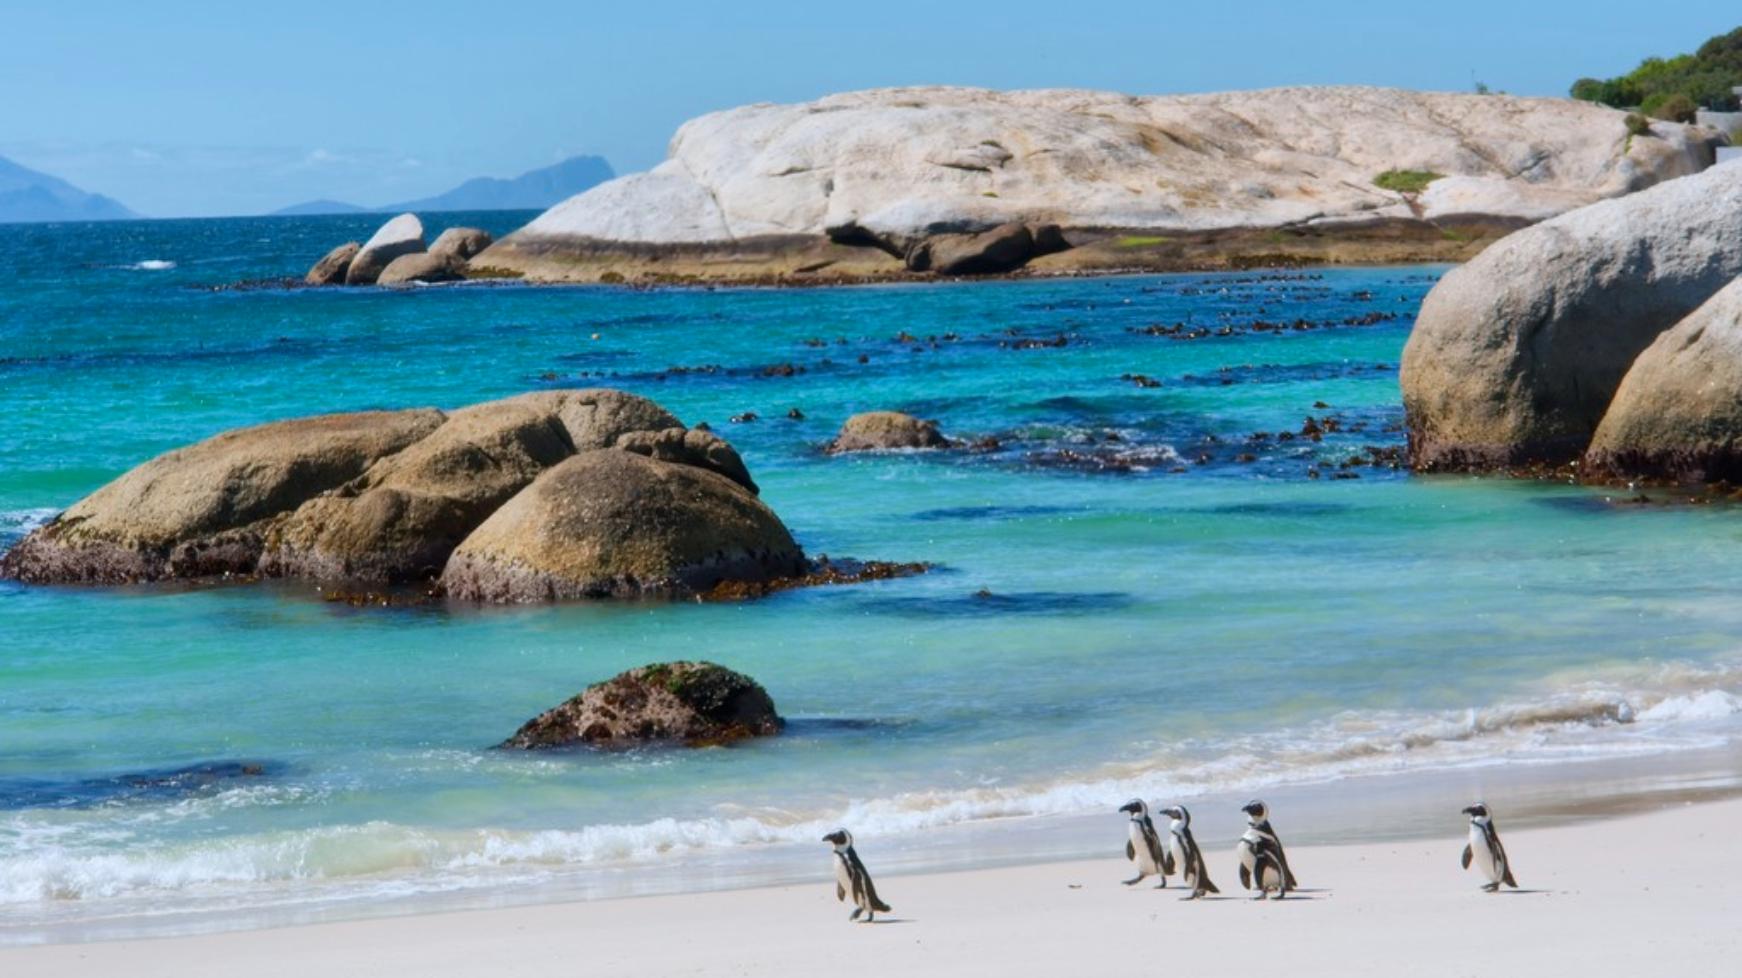 Penguins Walking on a Sunny Beach